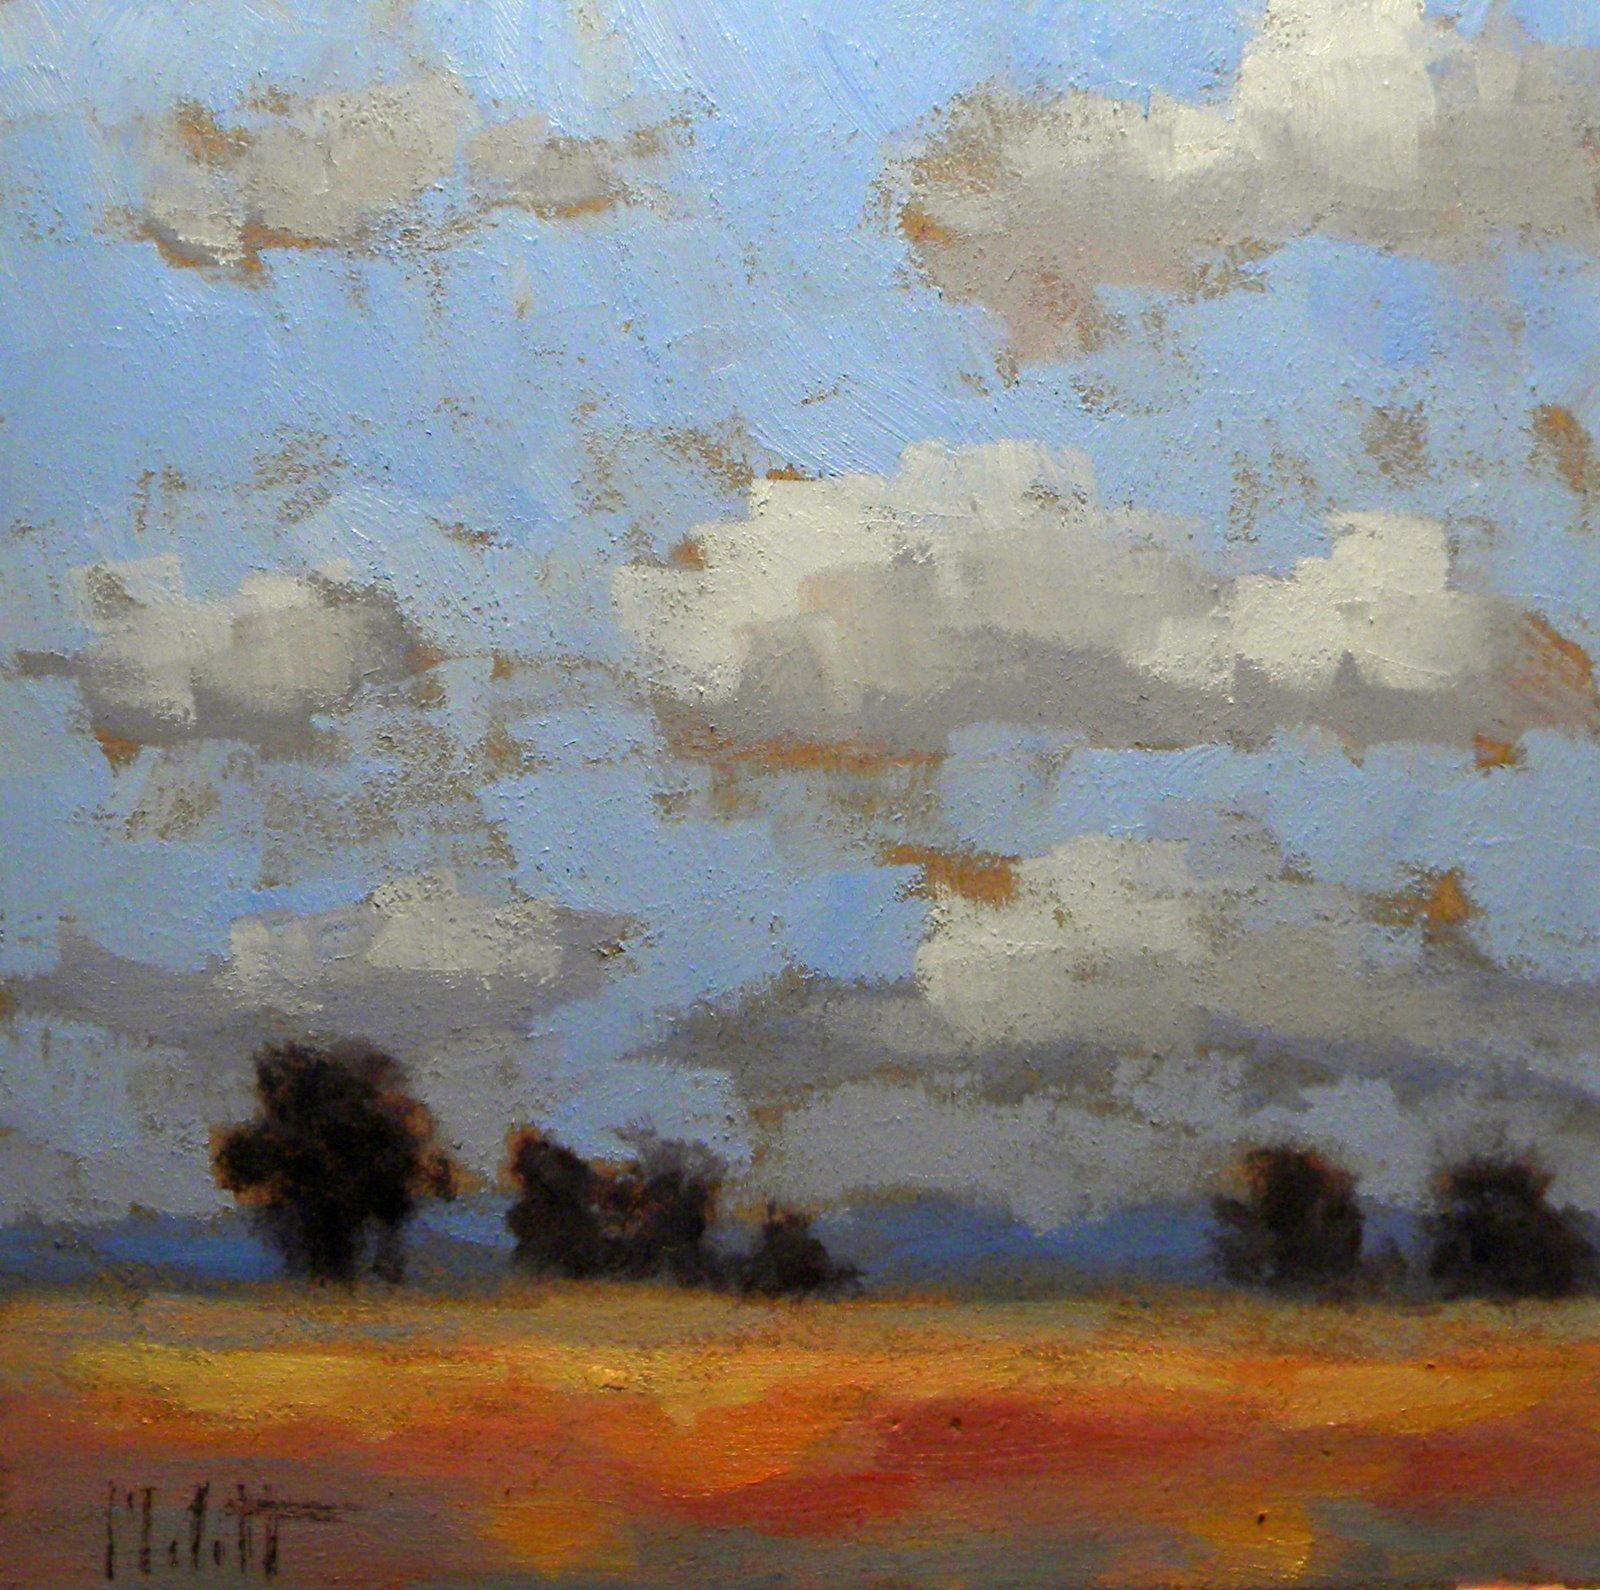 impressionism art landscape - photo #22